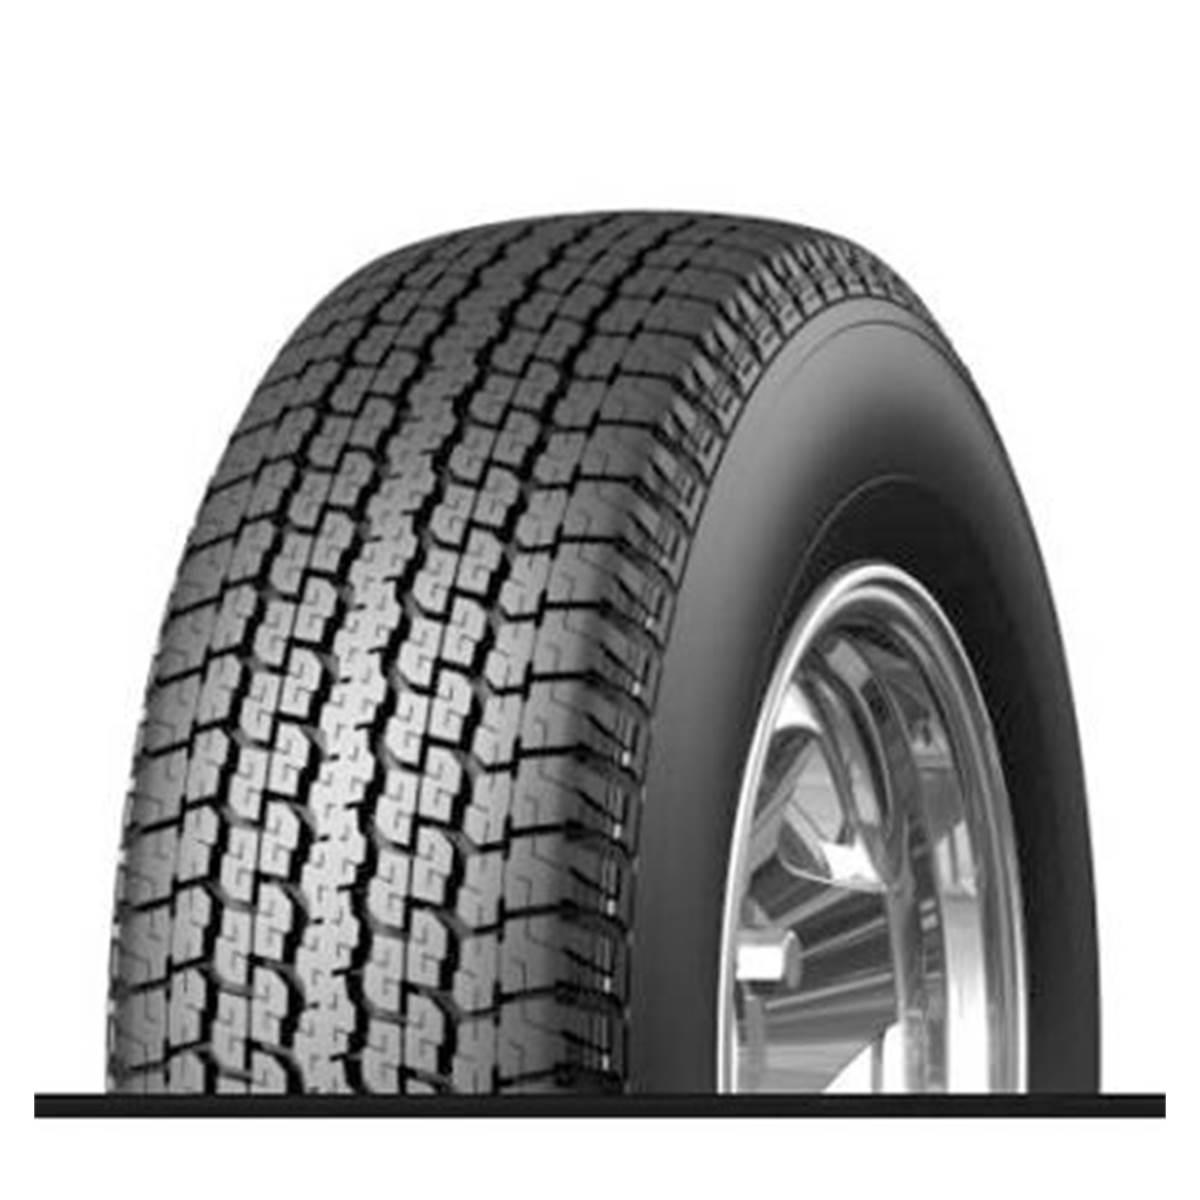 Pneu Bridgestone 265/60X18 110 H DUELER D840